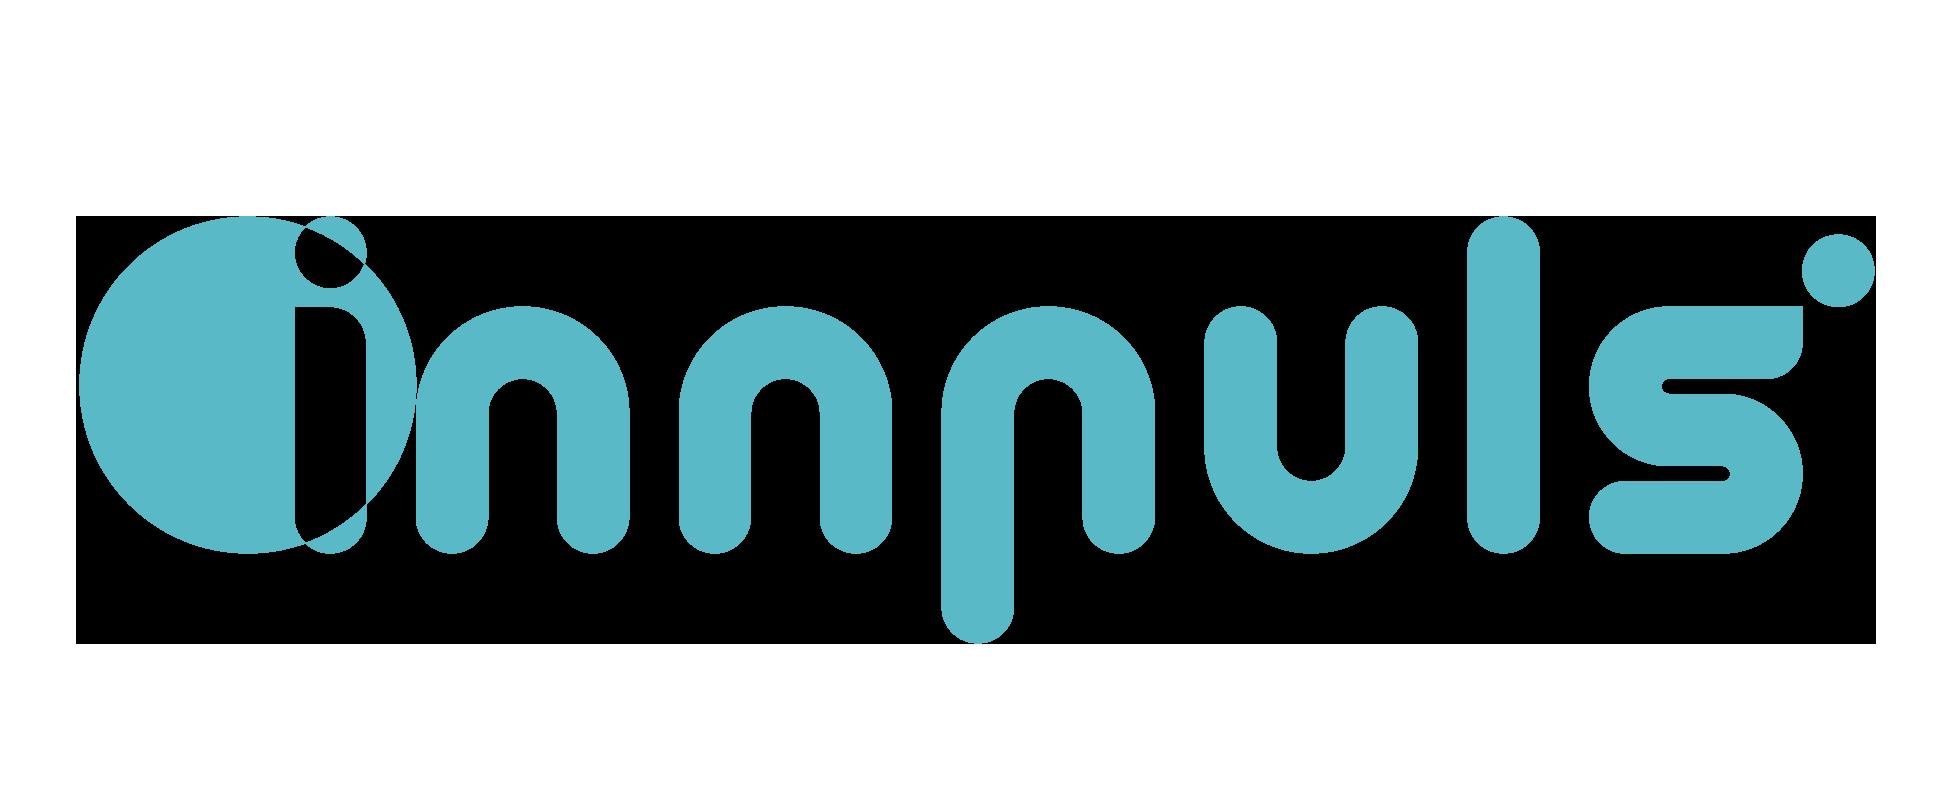 INNPULS_画板 1 - 副本.png